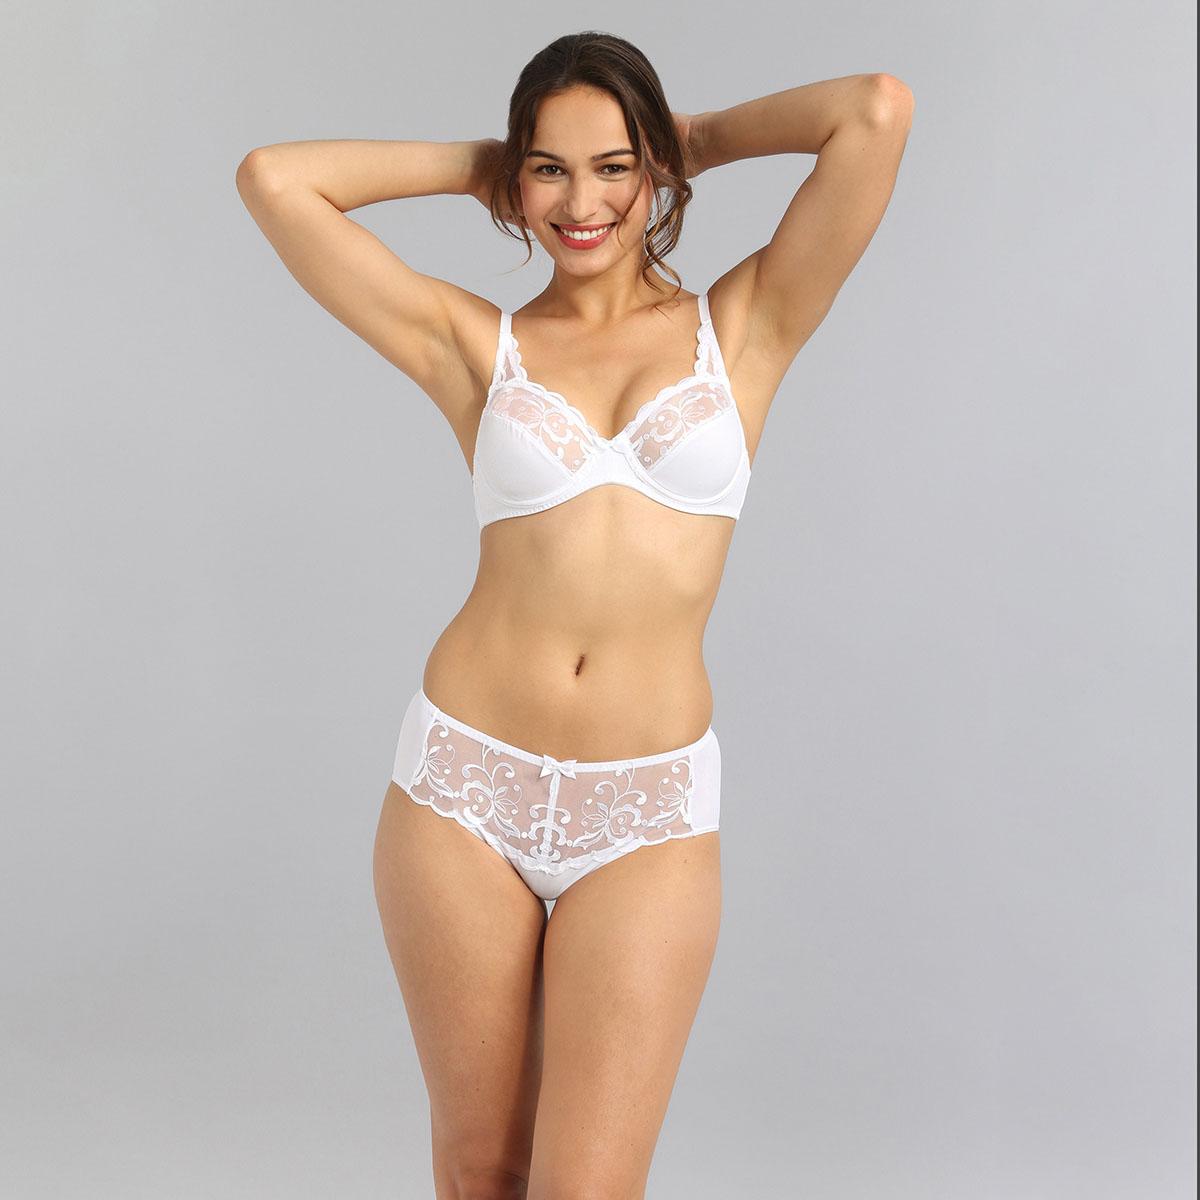 Underwired bra in white Essential Elegance Embroidery, , PLAYTEX